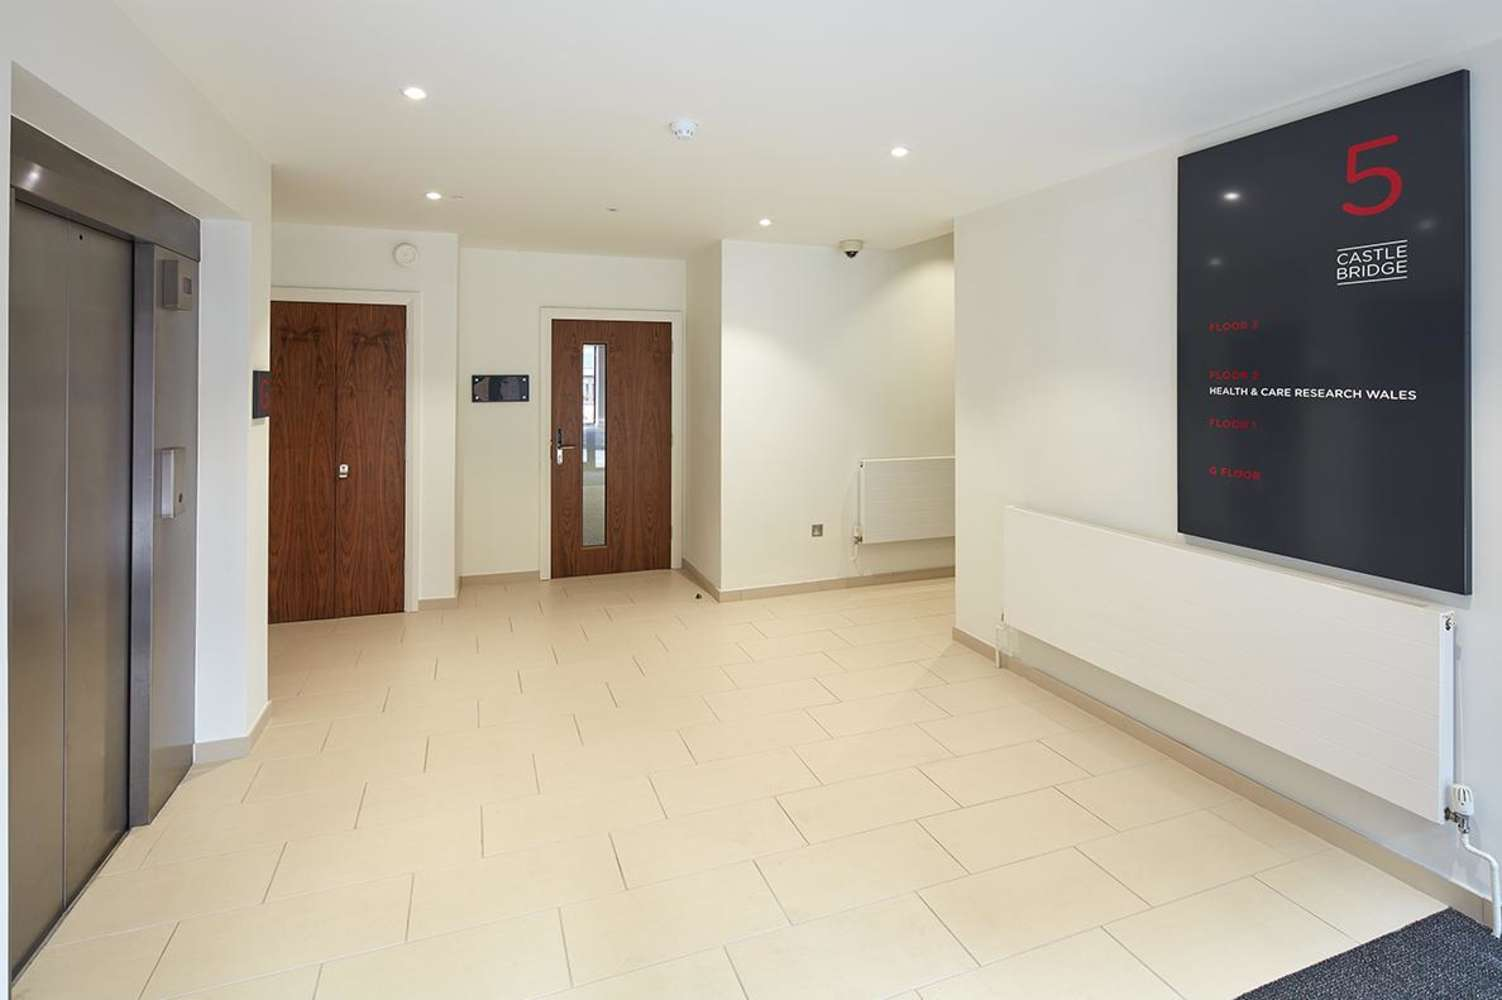 Offices Cardiff, CF11 9AB - Ground floor, 2 Castlebridge - 55862